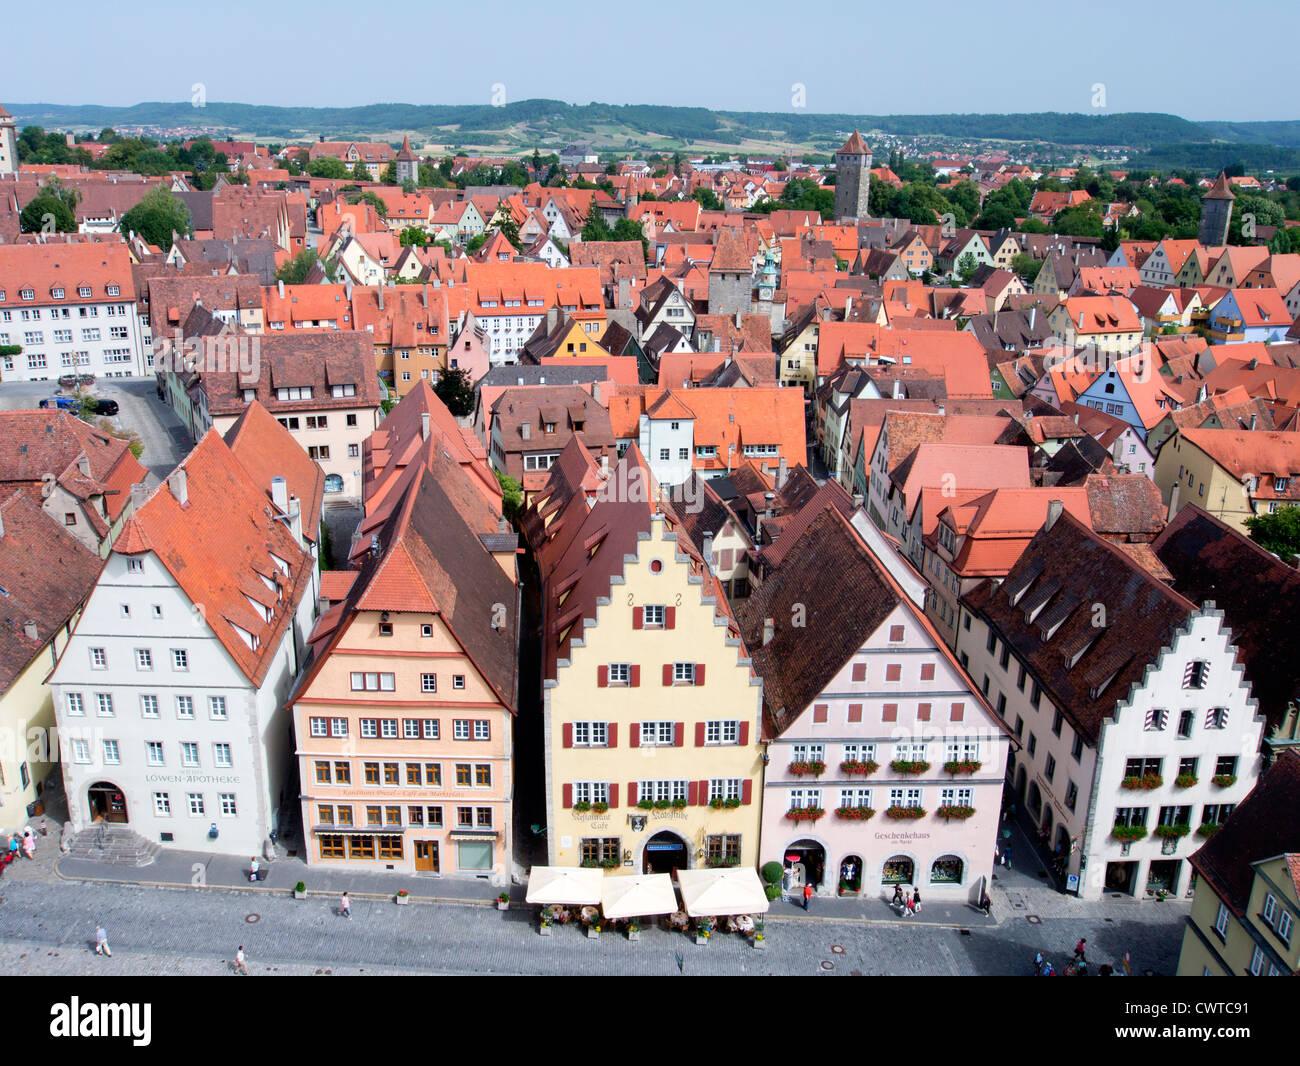 Rothenburg ob der Tauber medieval town in Bavaria Germany - Stock Image